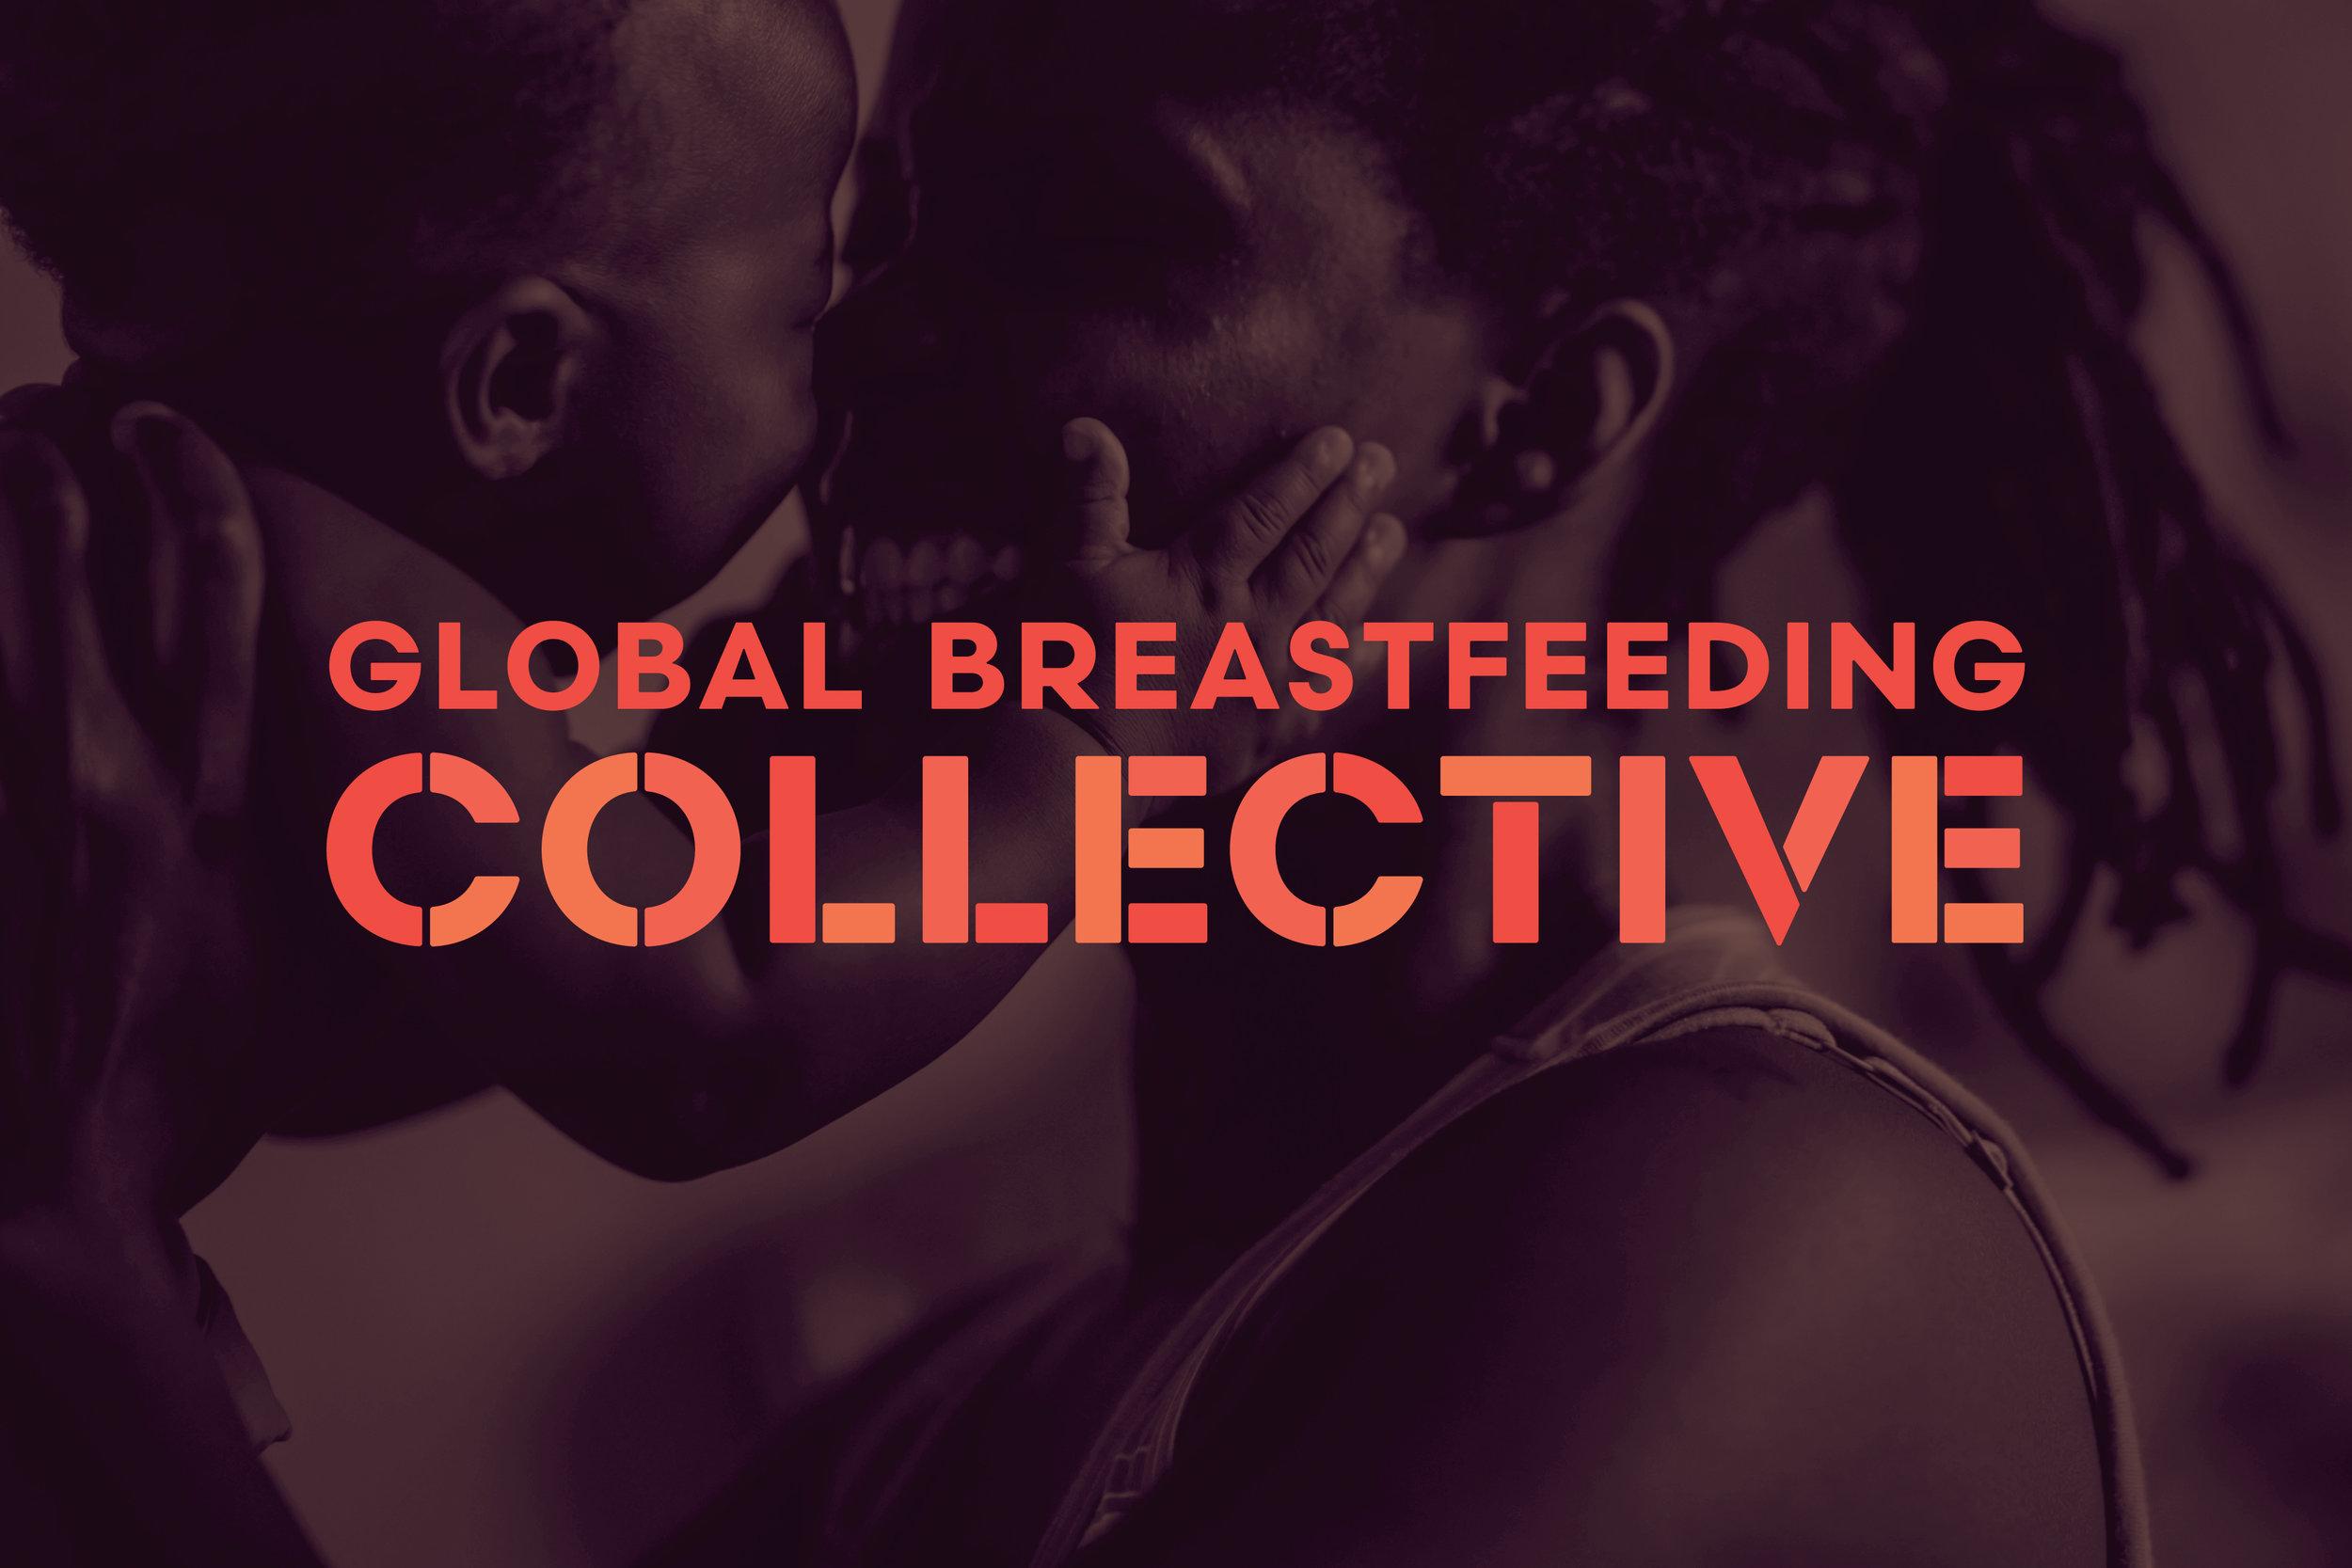 GLOBAL BREASTFEEDING COLLECTIVE